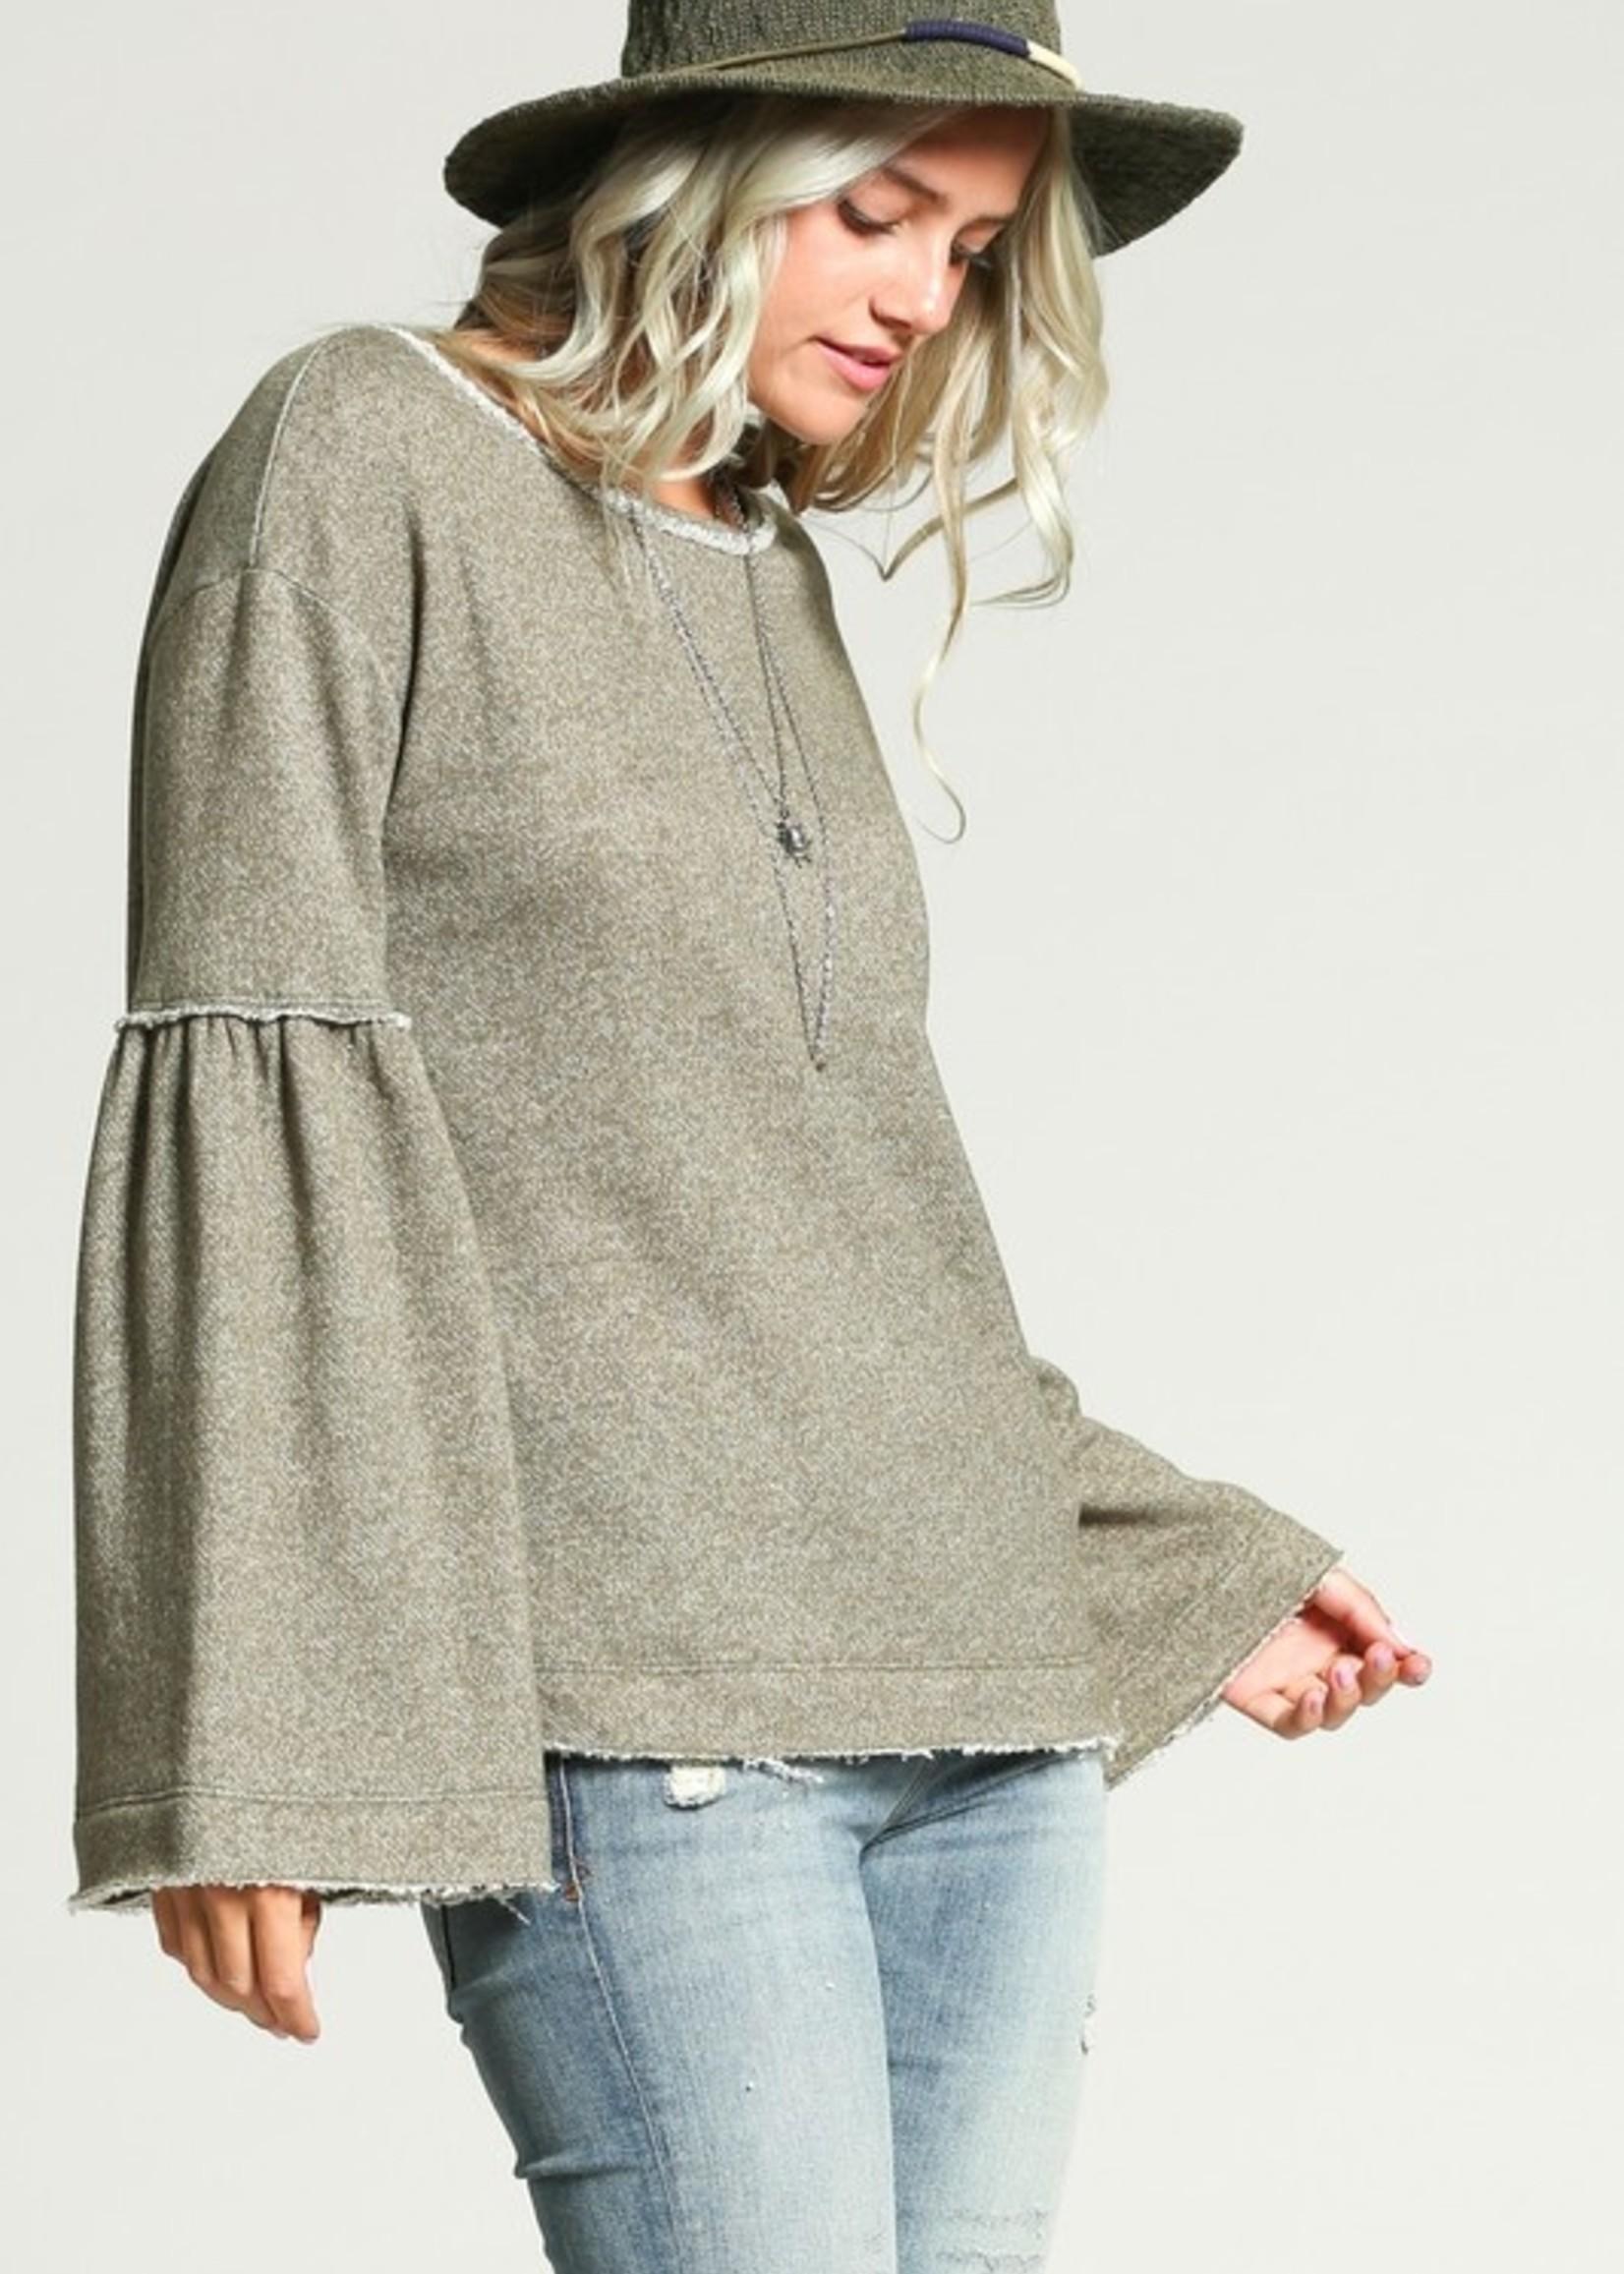 Bell sleeve sweatshirt